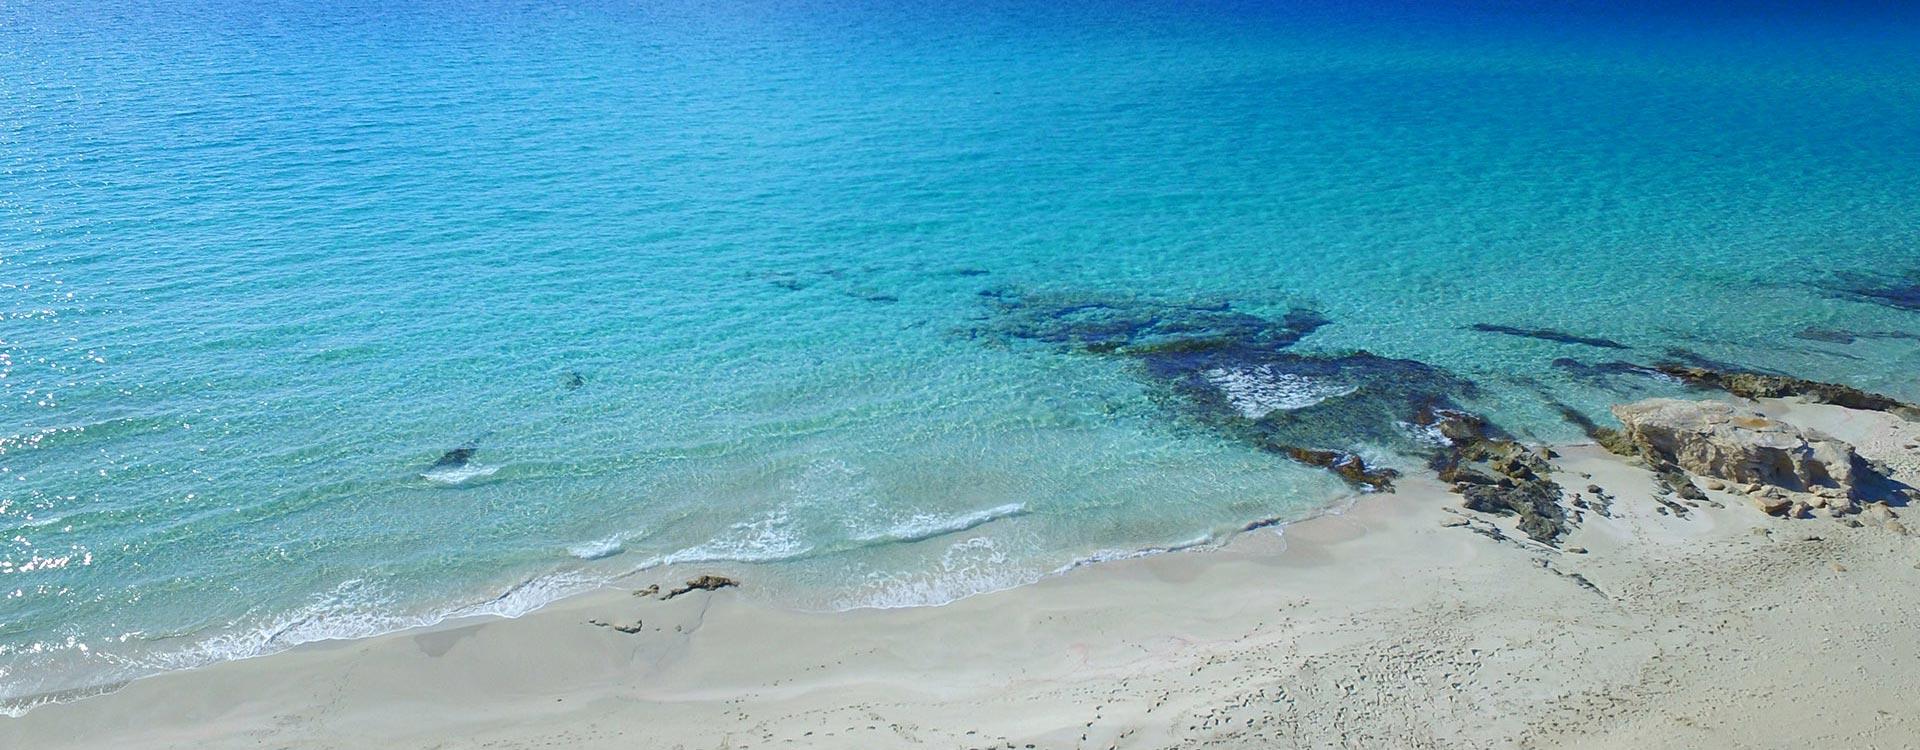 Vista aérea de la Playa de Migjorn